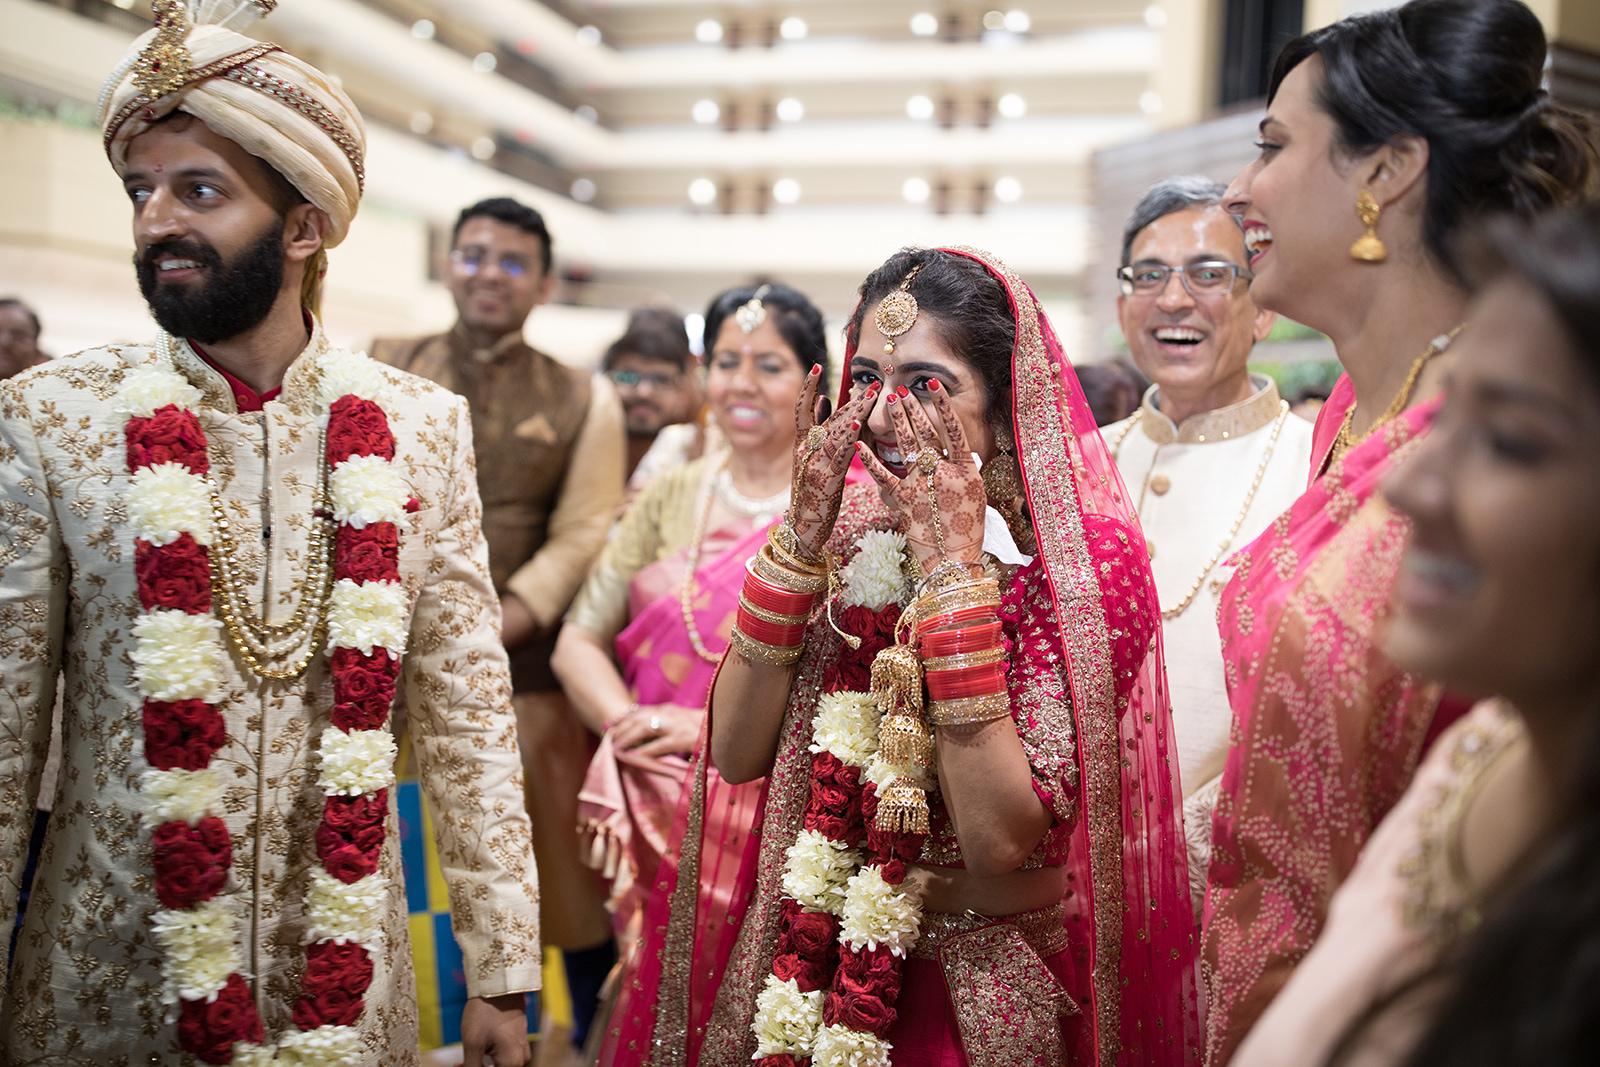 Le Cape Weddings - Sumeet and Chavi - Vidai --3.jpg